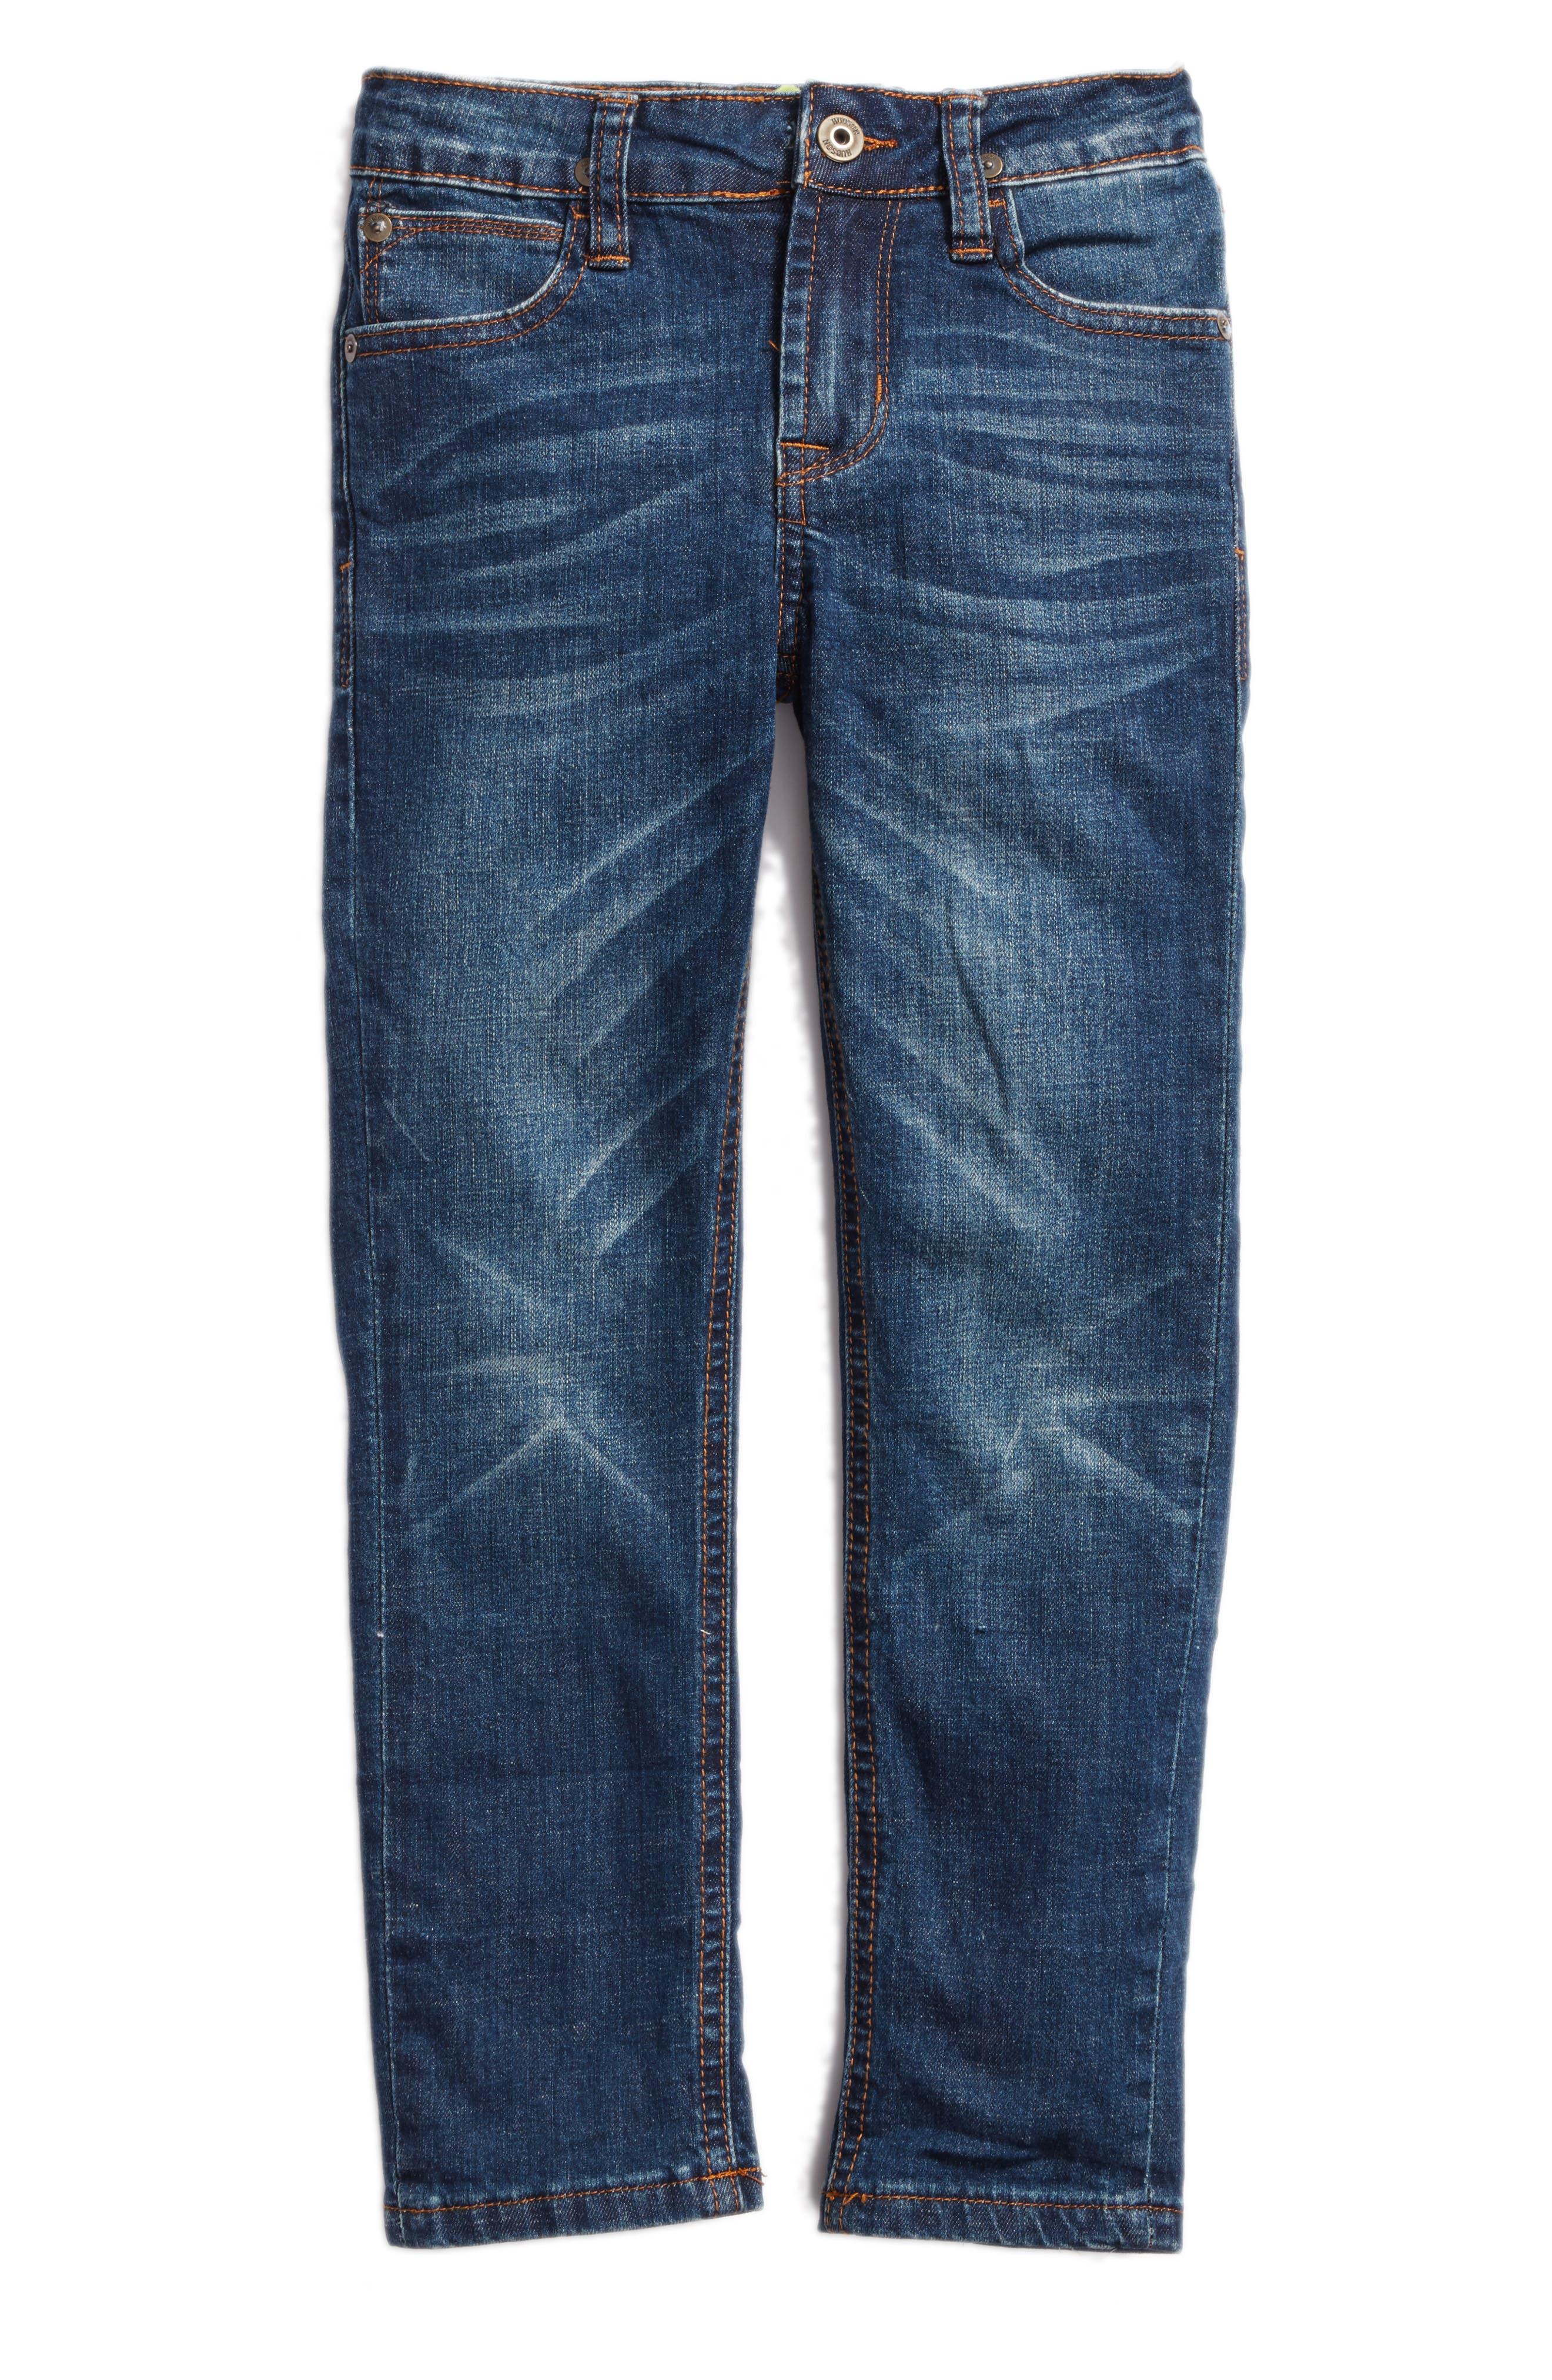 Jagger Straight Leg Jeans,                             Alternate thumbnail 2, color,                             426